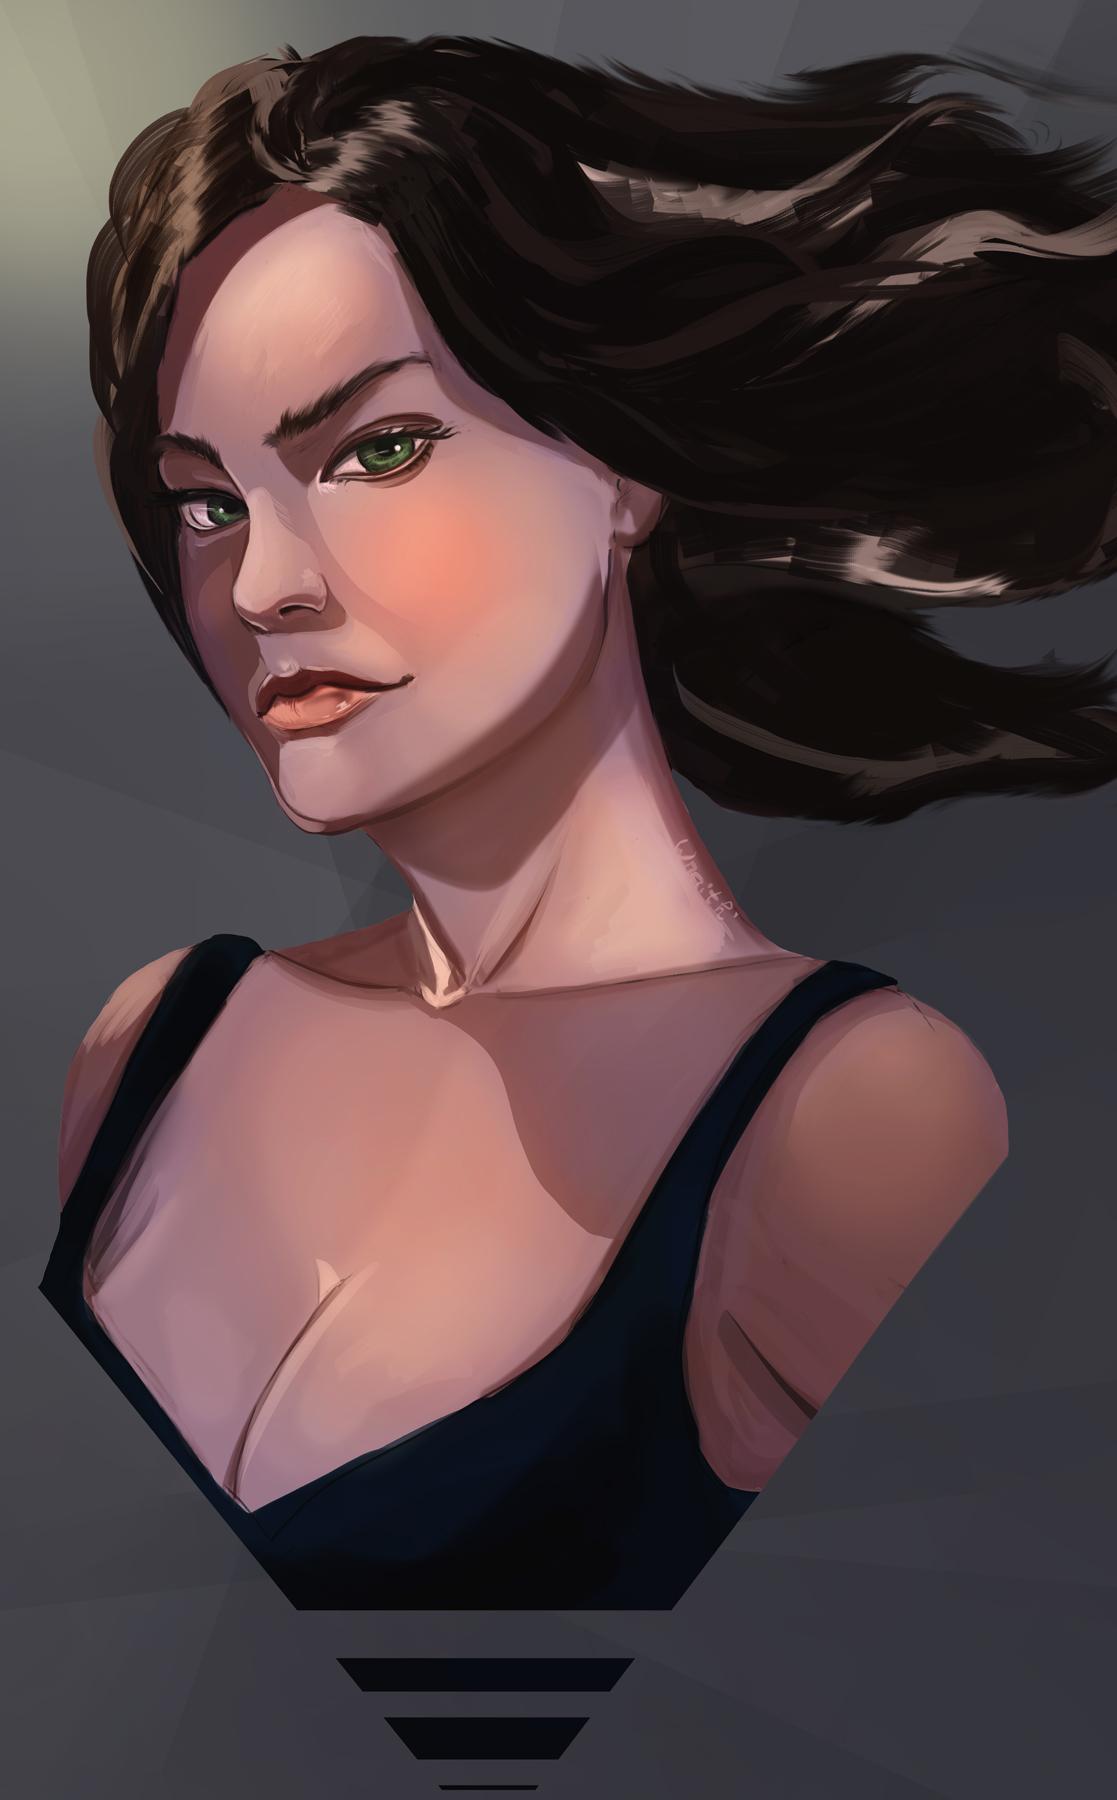 girl_portrait_feb'18